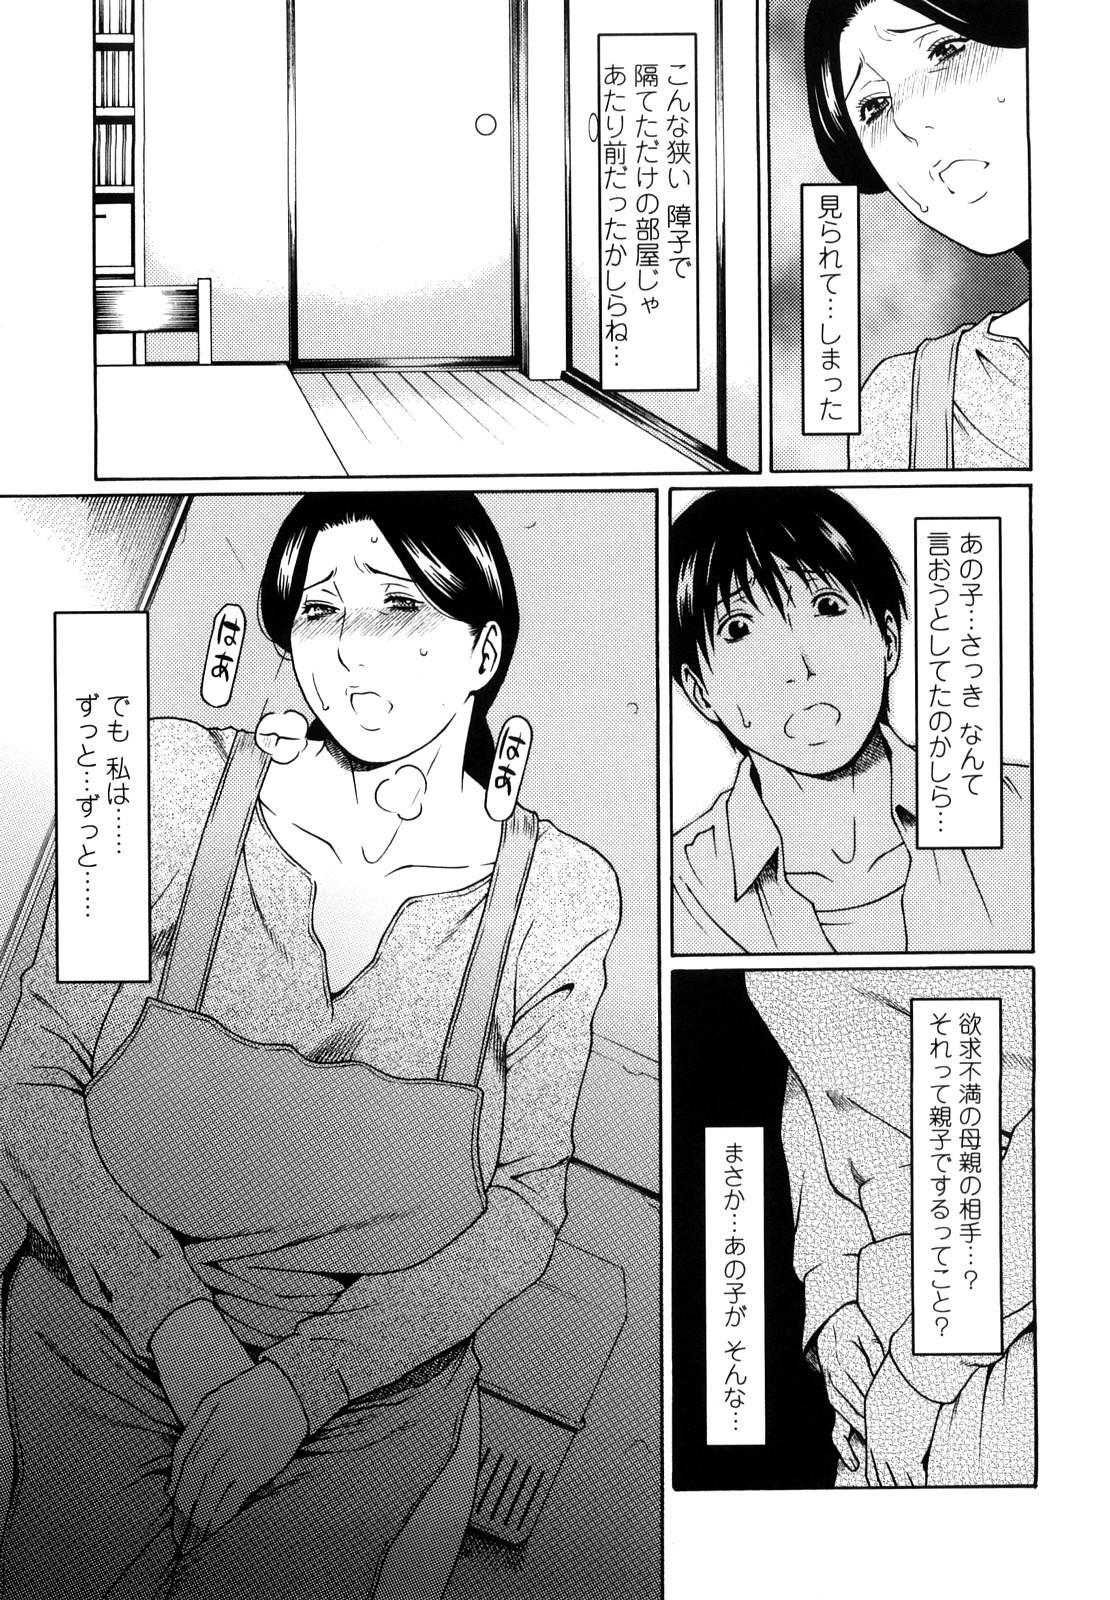 [Takasugi Kou] Kindan no Haha-Ana - Immorality Love-Hole [Decensored] 26